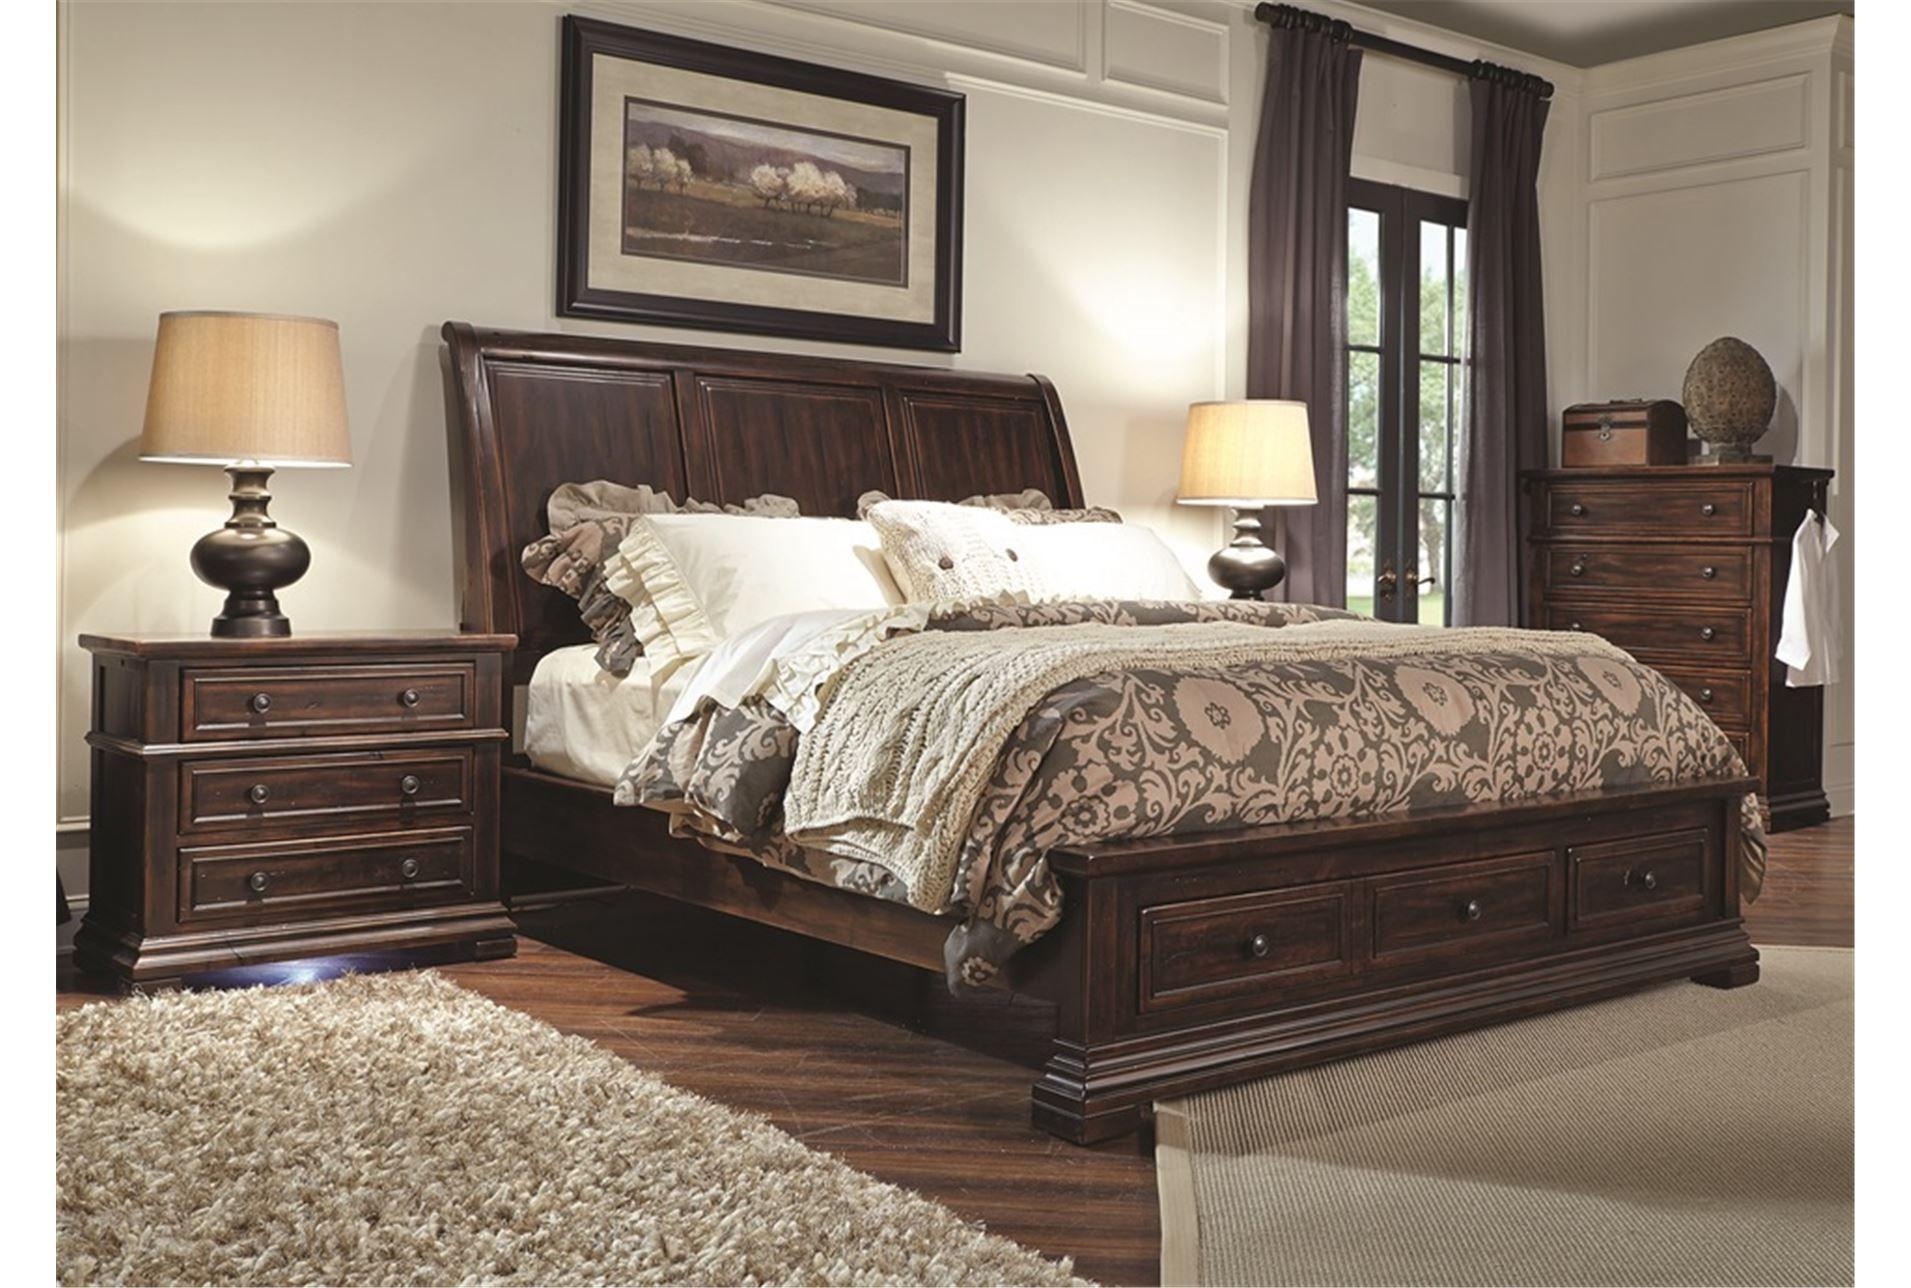 harold california king storage bed. harold california king storage bed  storage beds king storage